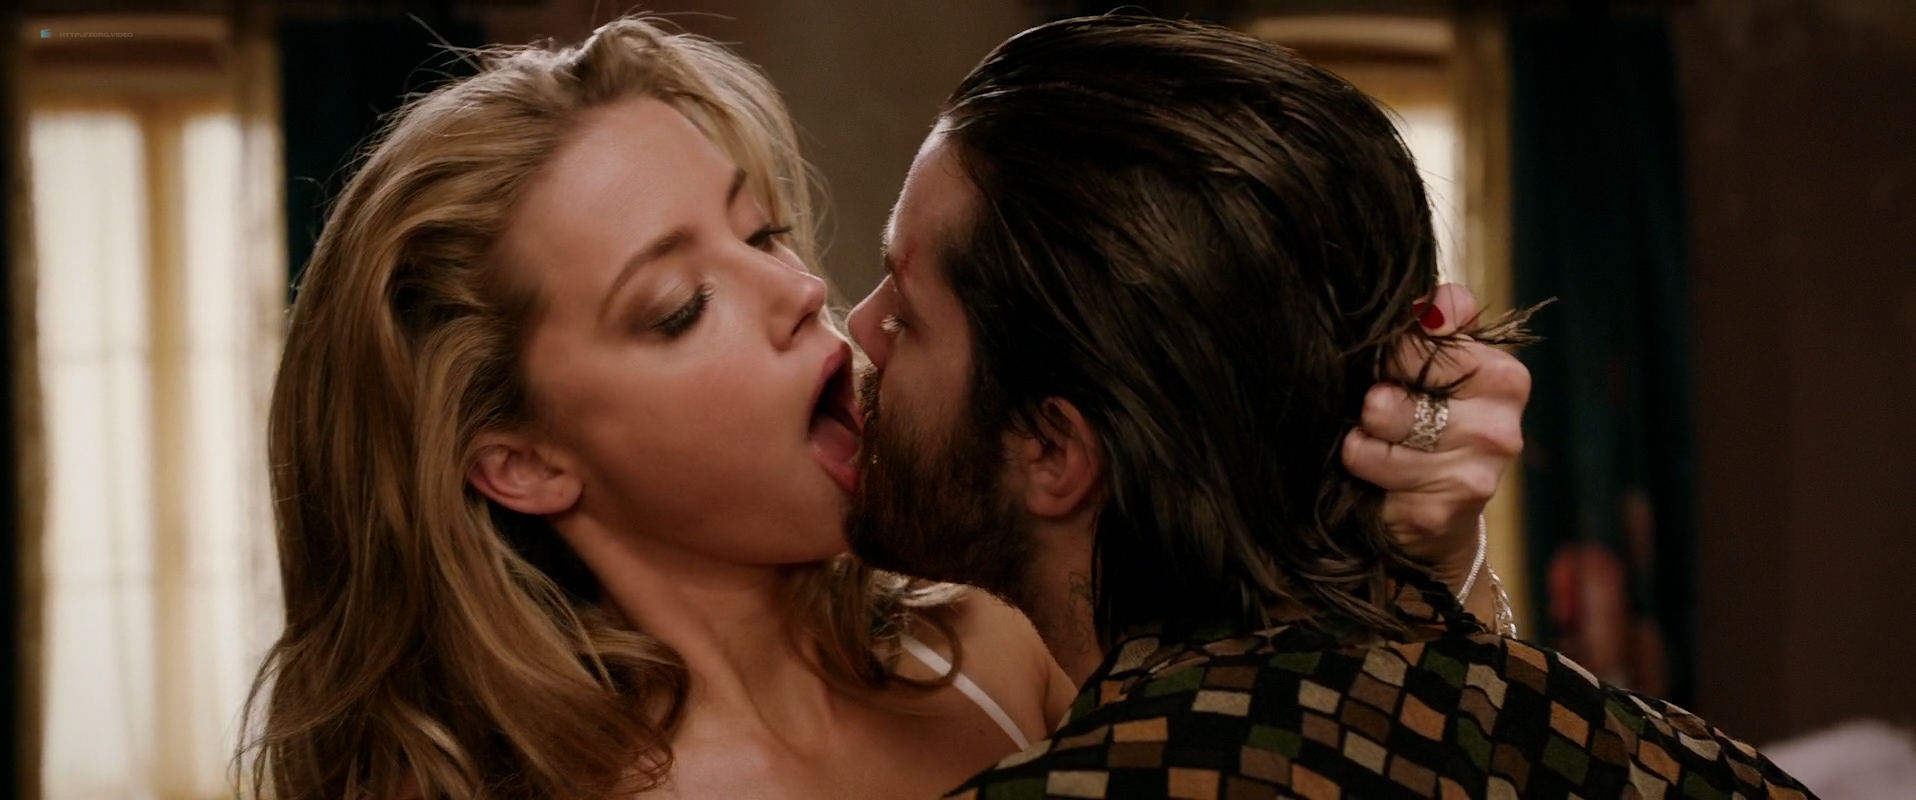 Amber Heard Porn Movie amber heard nude butt and very hot - london fields (2018) hd